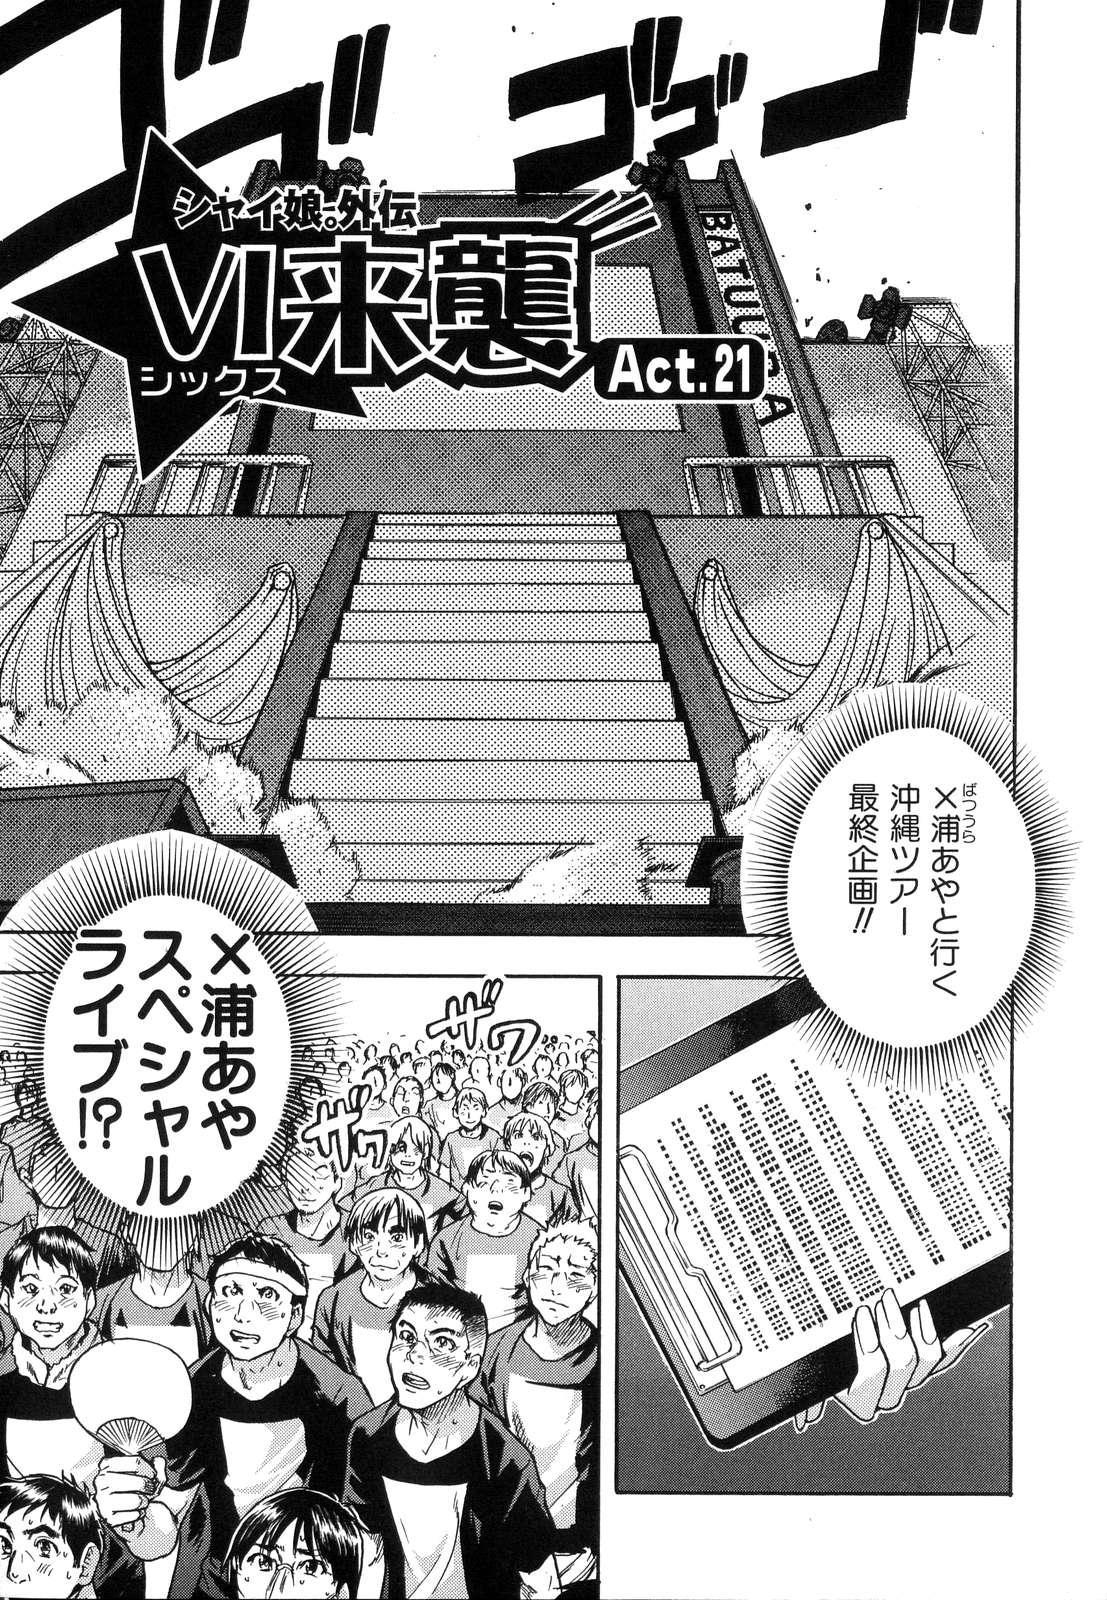 Shining Musume. 6. Rainbow Six 170